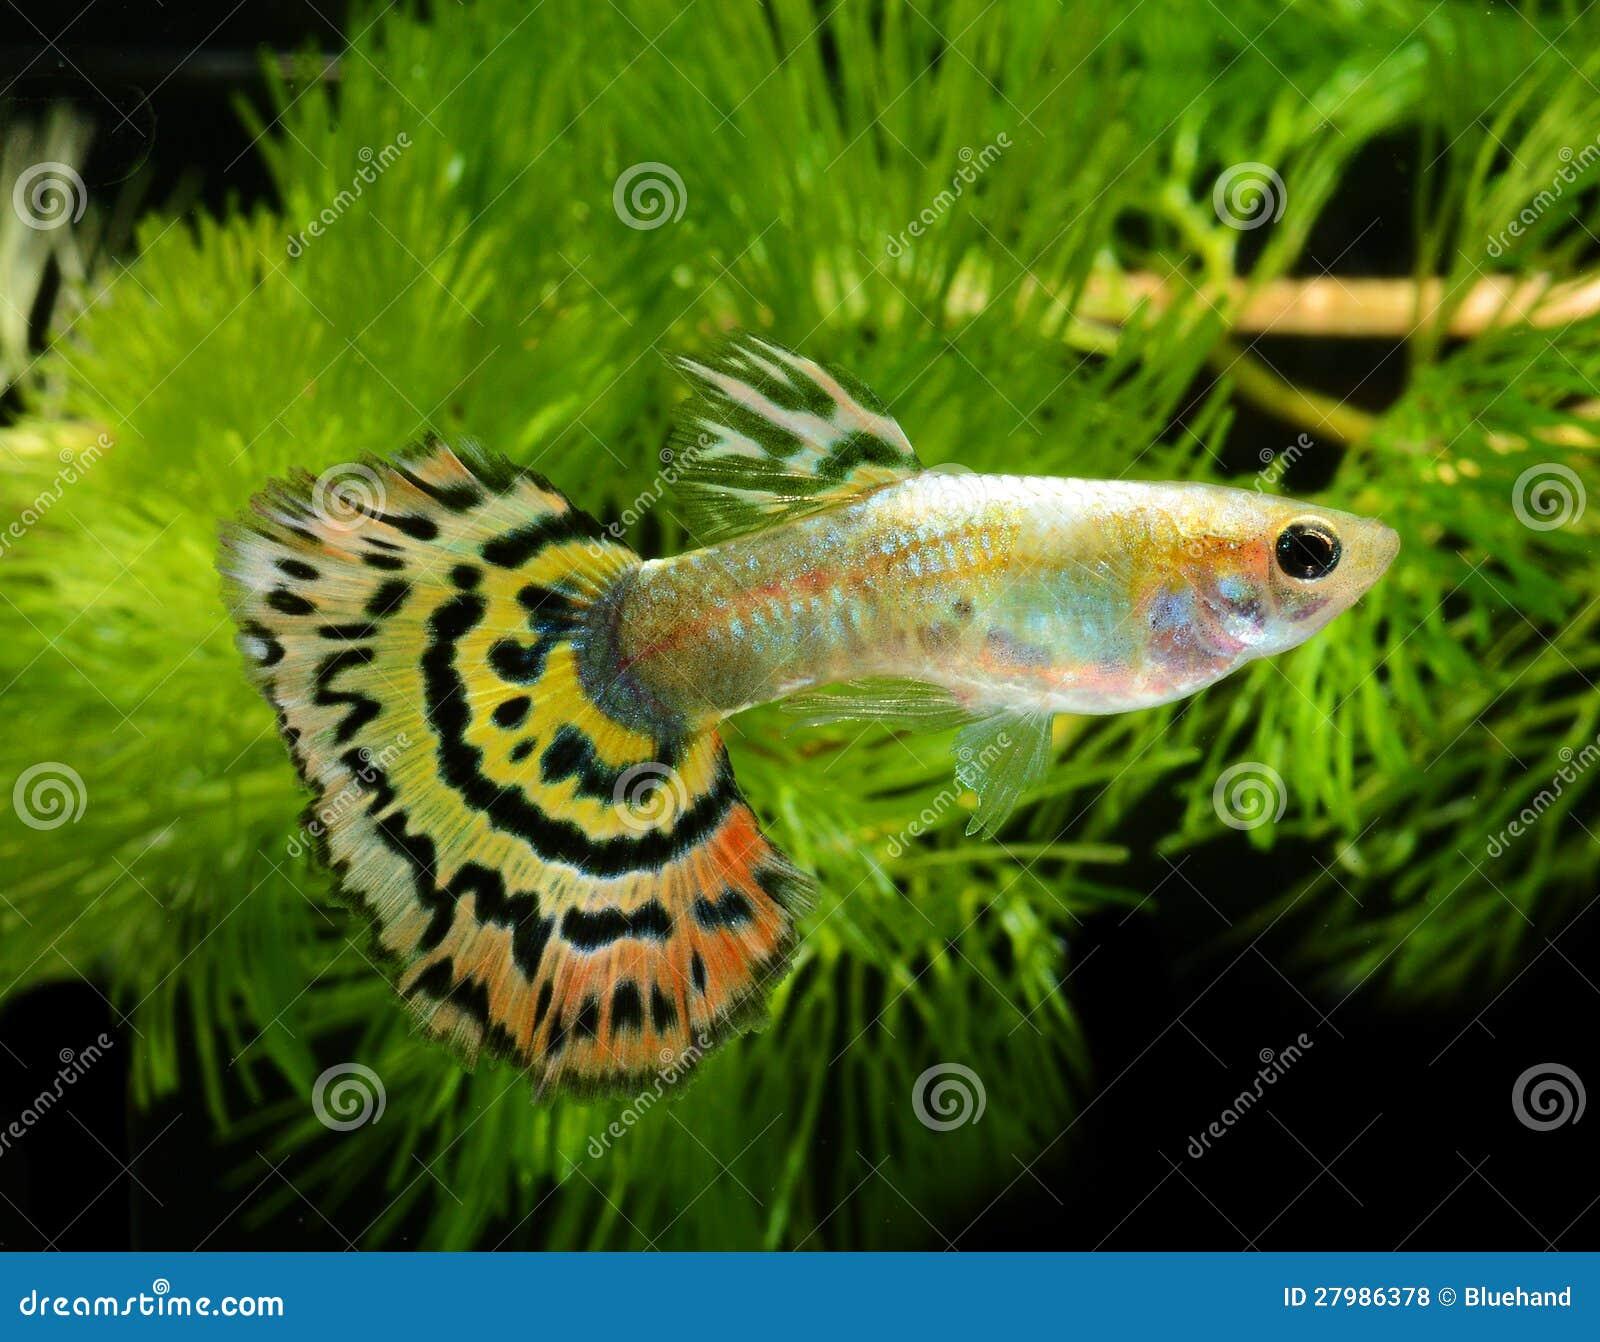 fish guppy stock photo  image of fresh  animal  fish